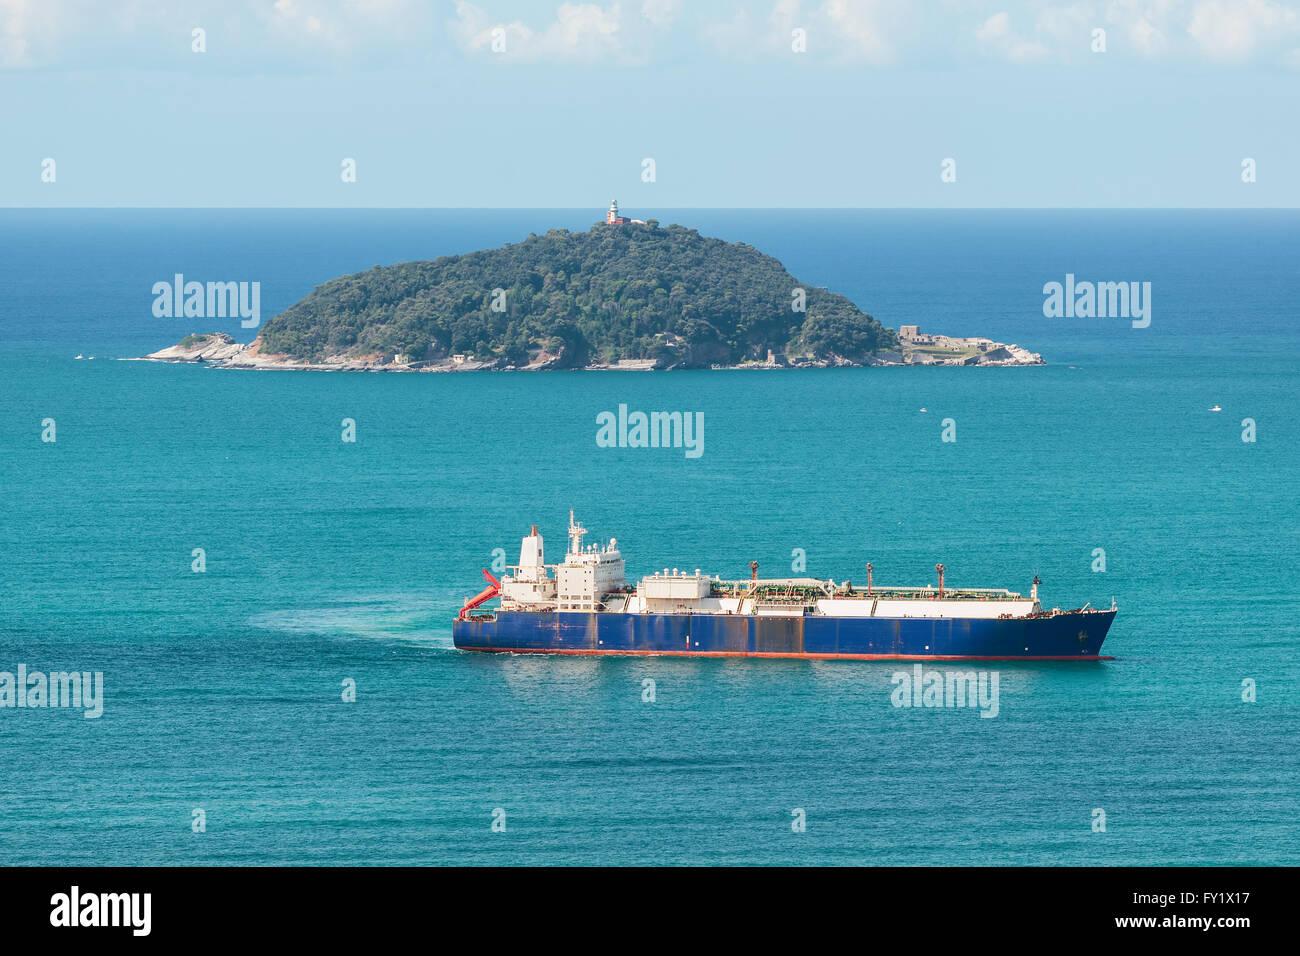 tanker ship sailing in the sea near an island - Stock Image